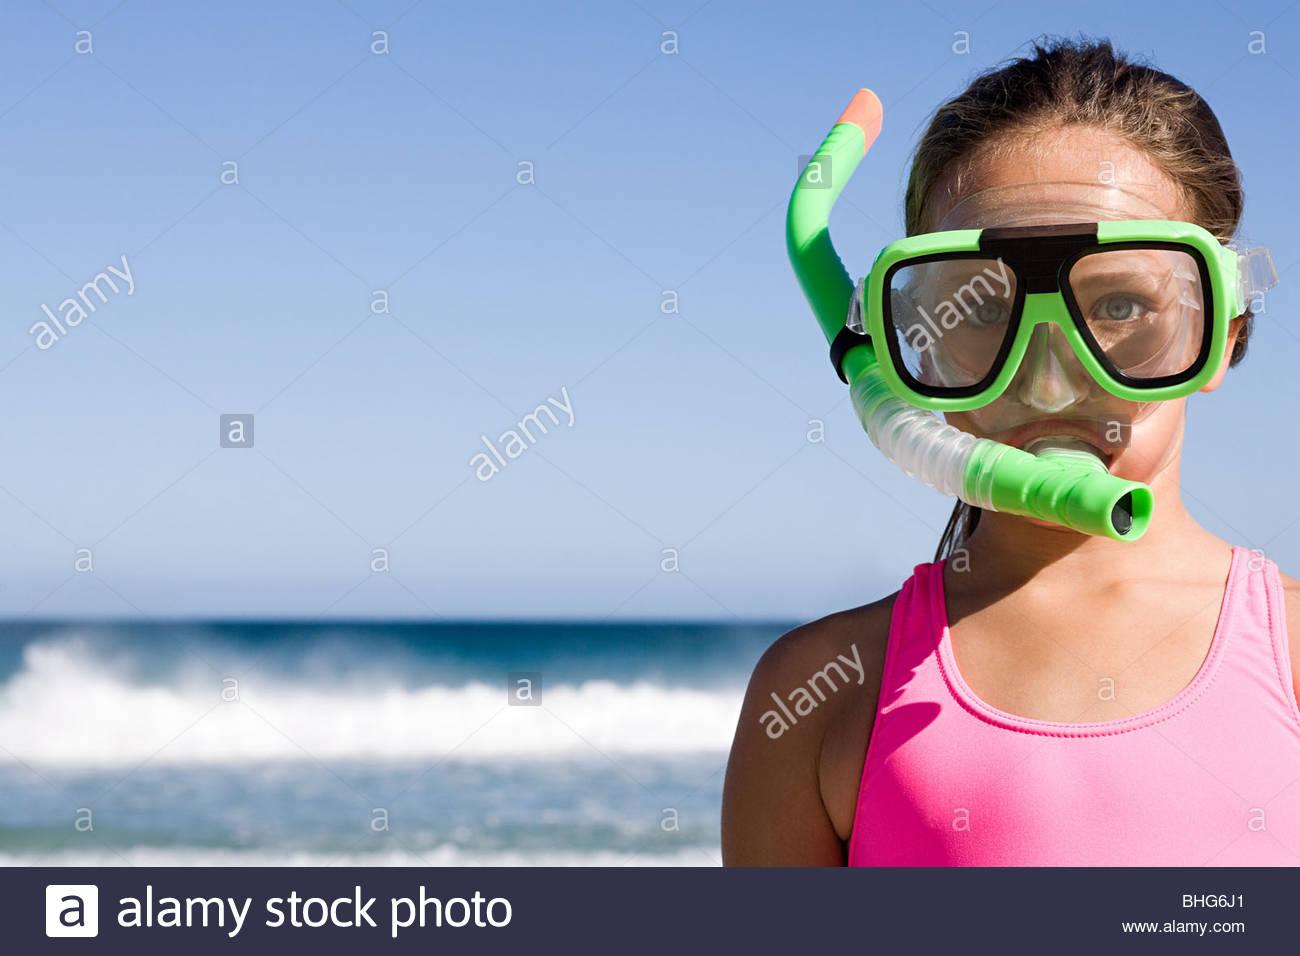 Little girl standing in front of ocean wearing snorkel mask - Stock Image